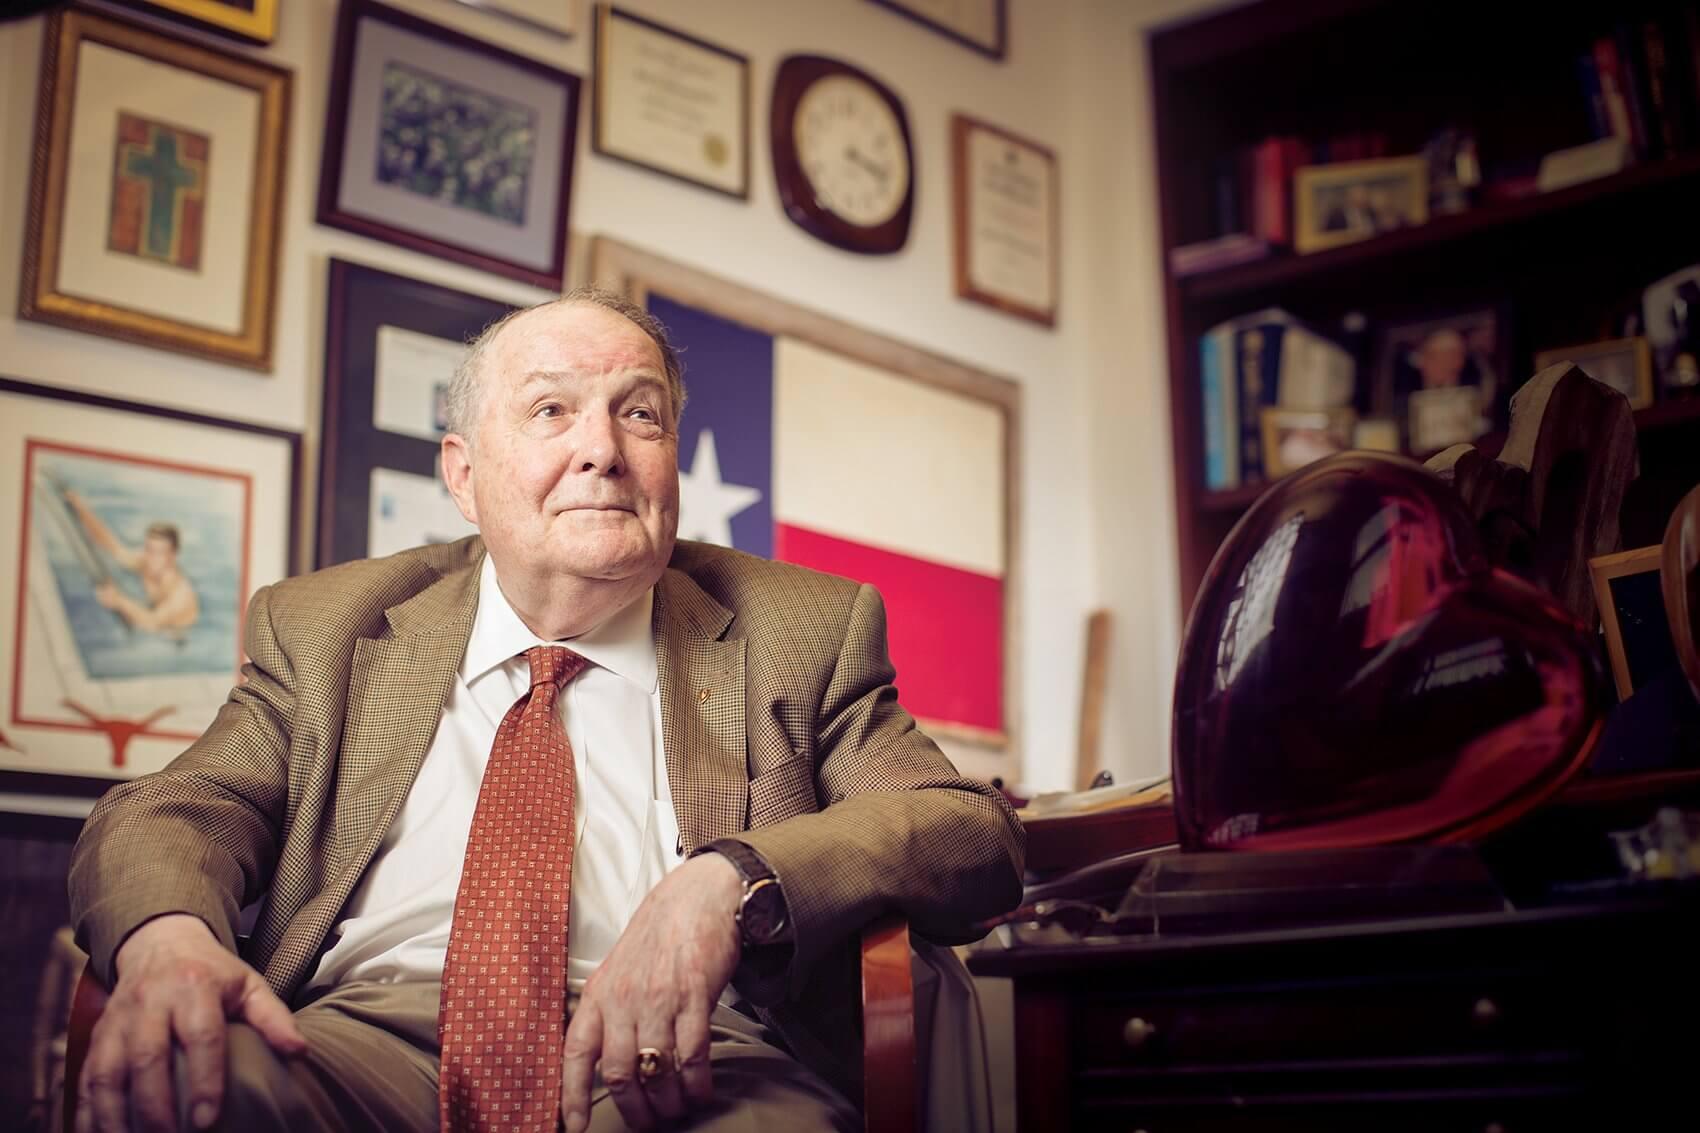 James T. Willerson, M.D., president, Texas Heart Institute